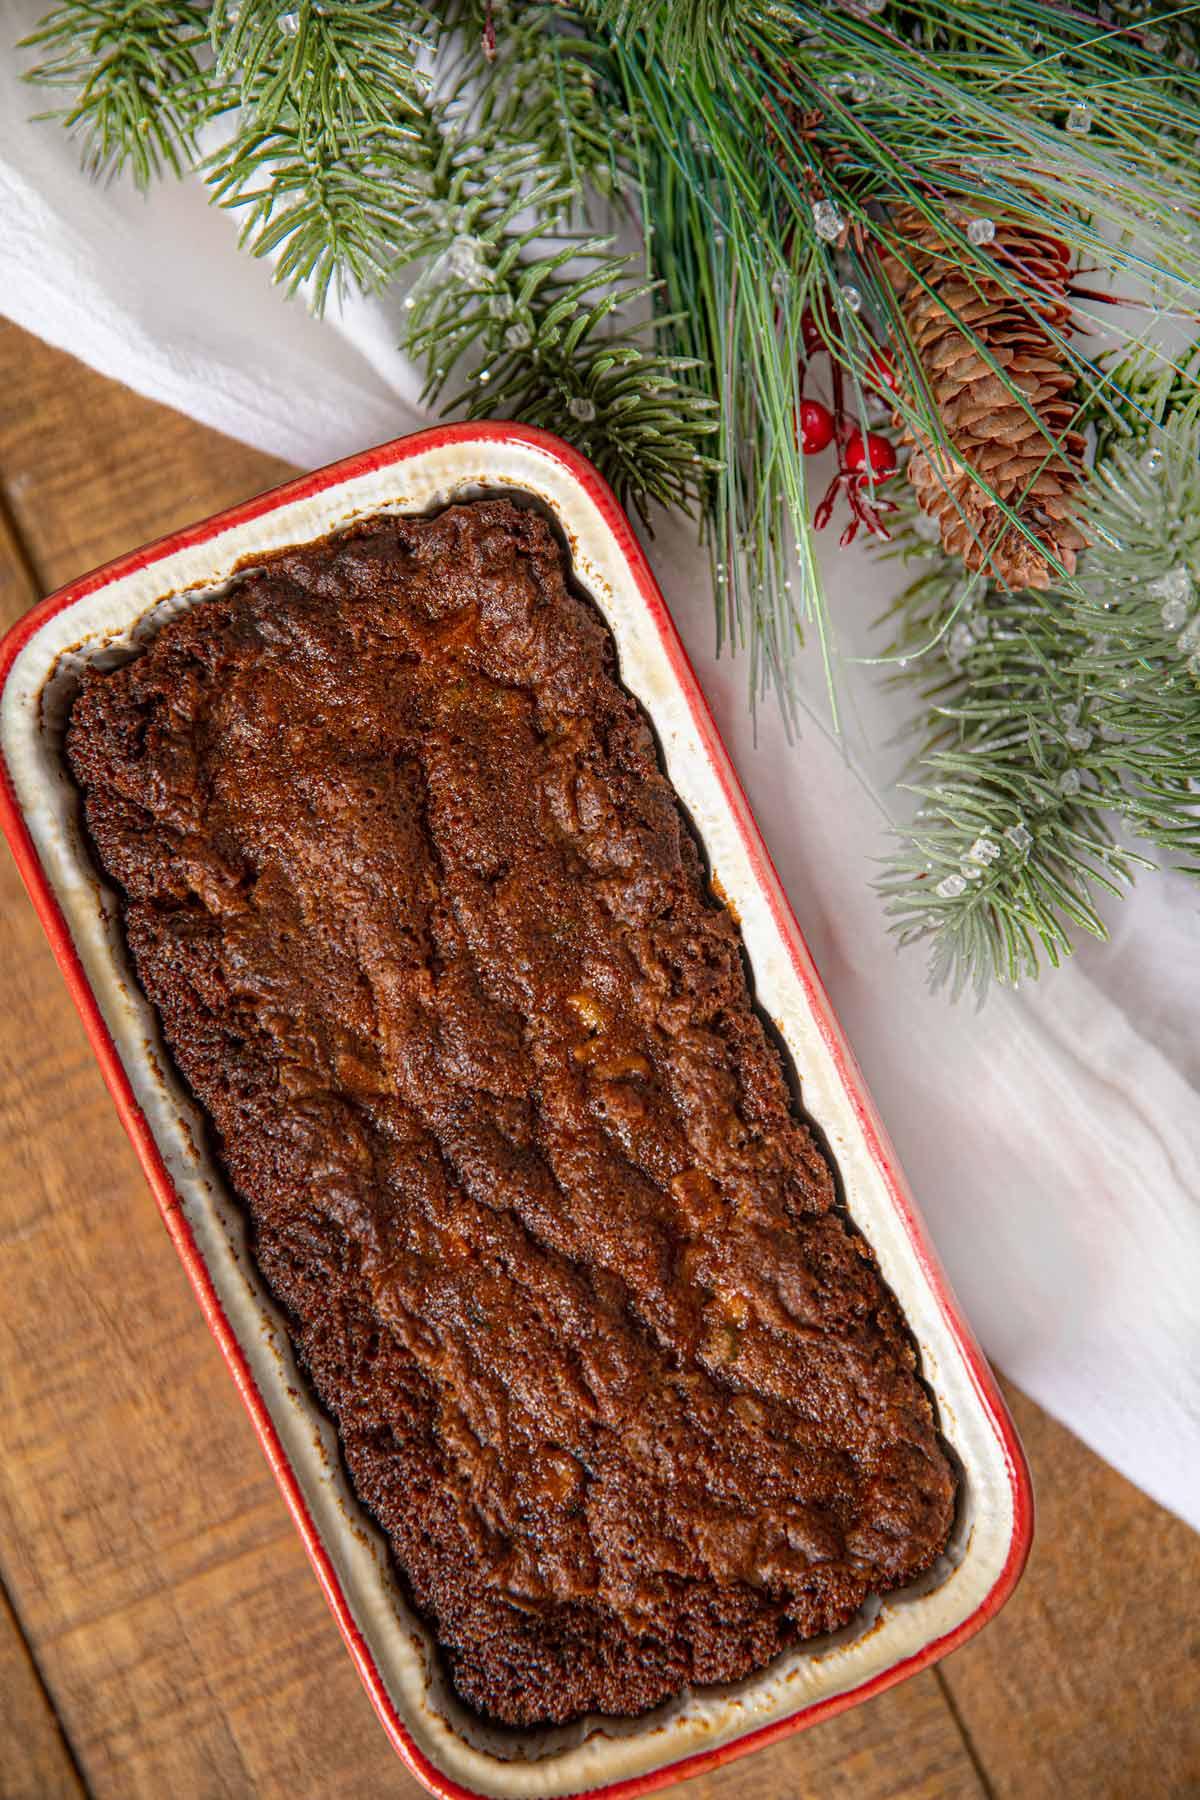 Fruit Cake in red loaf pan